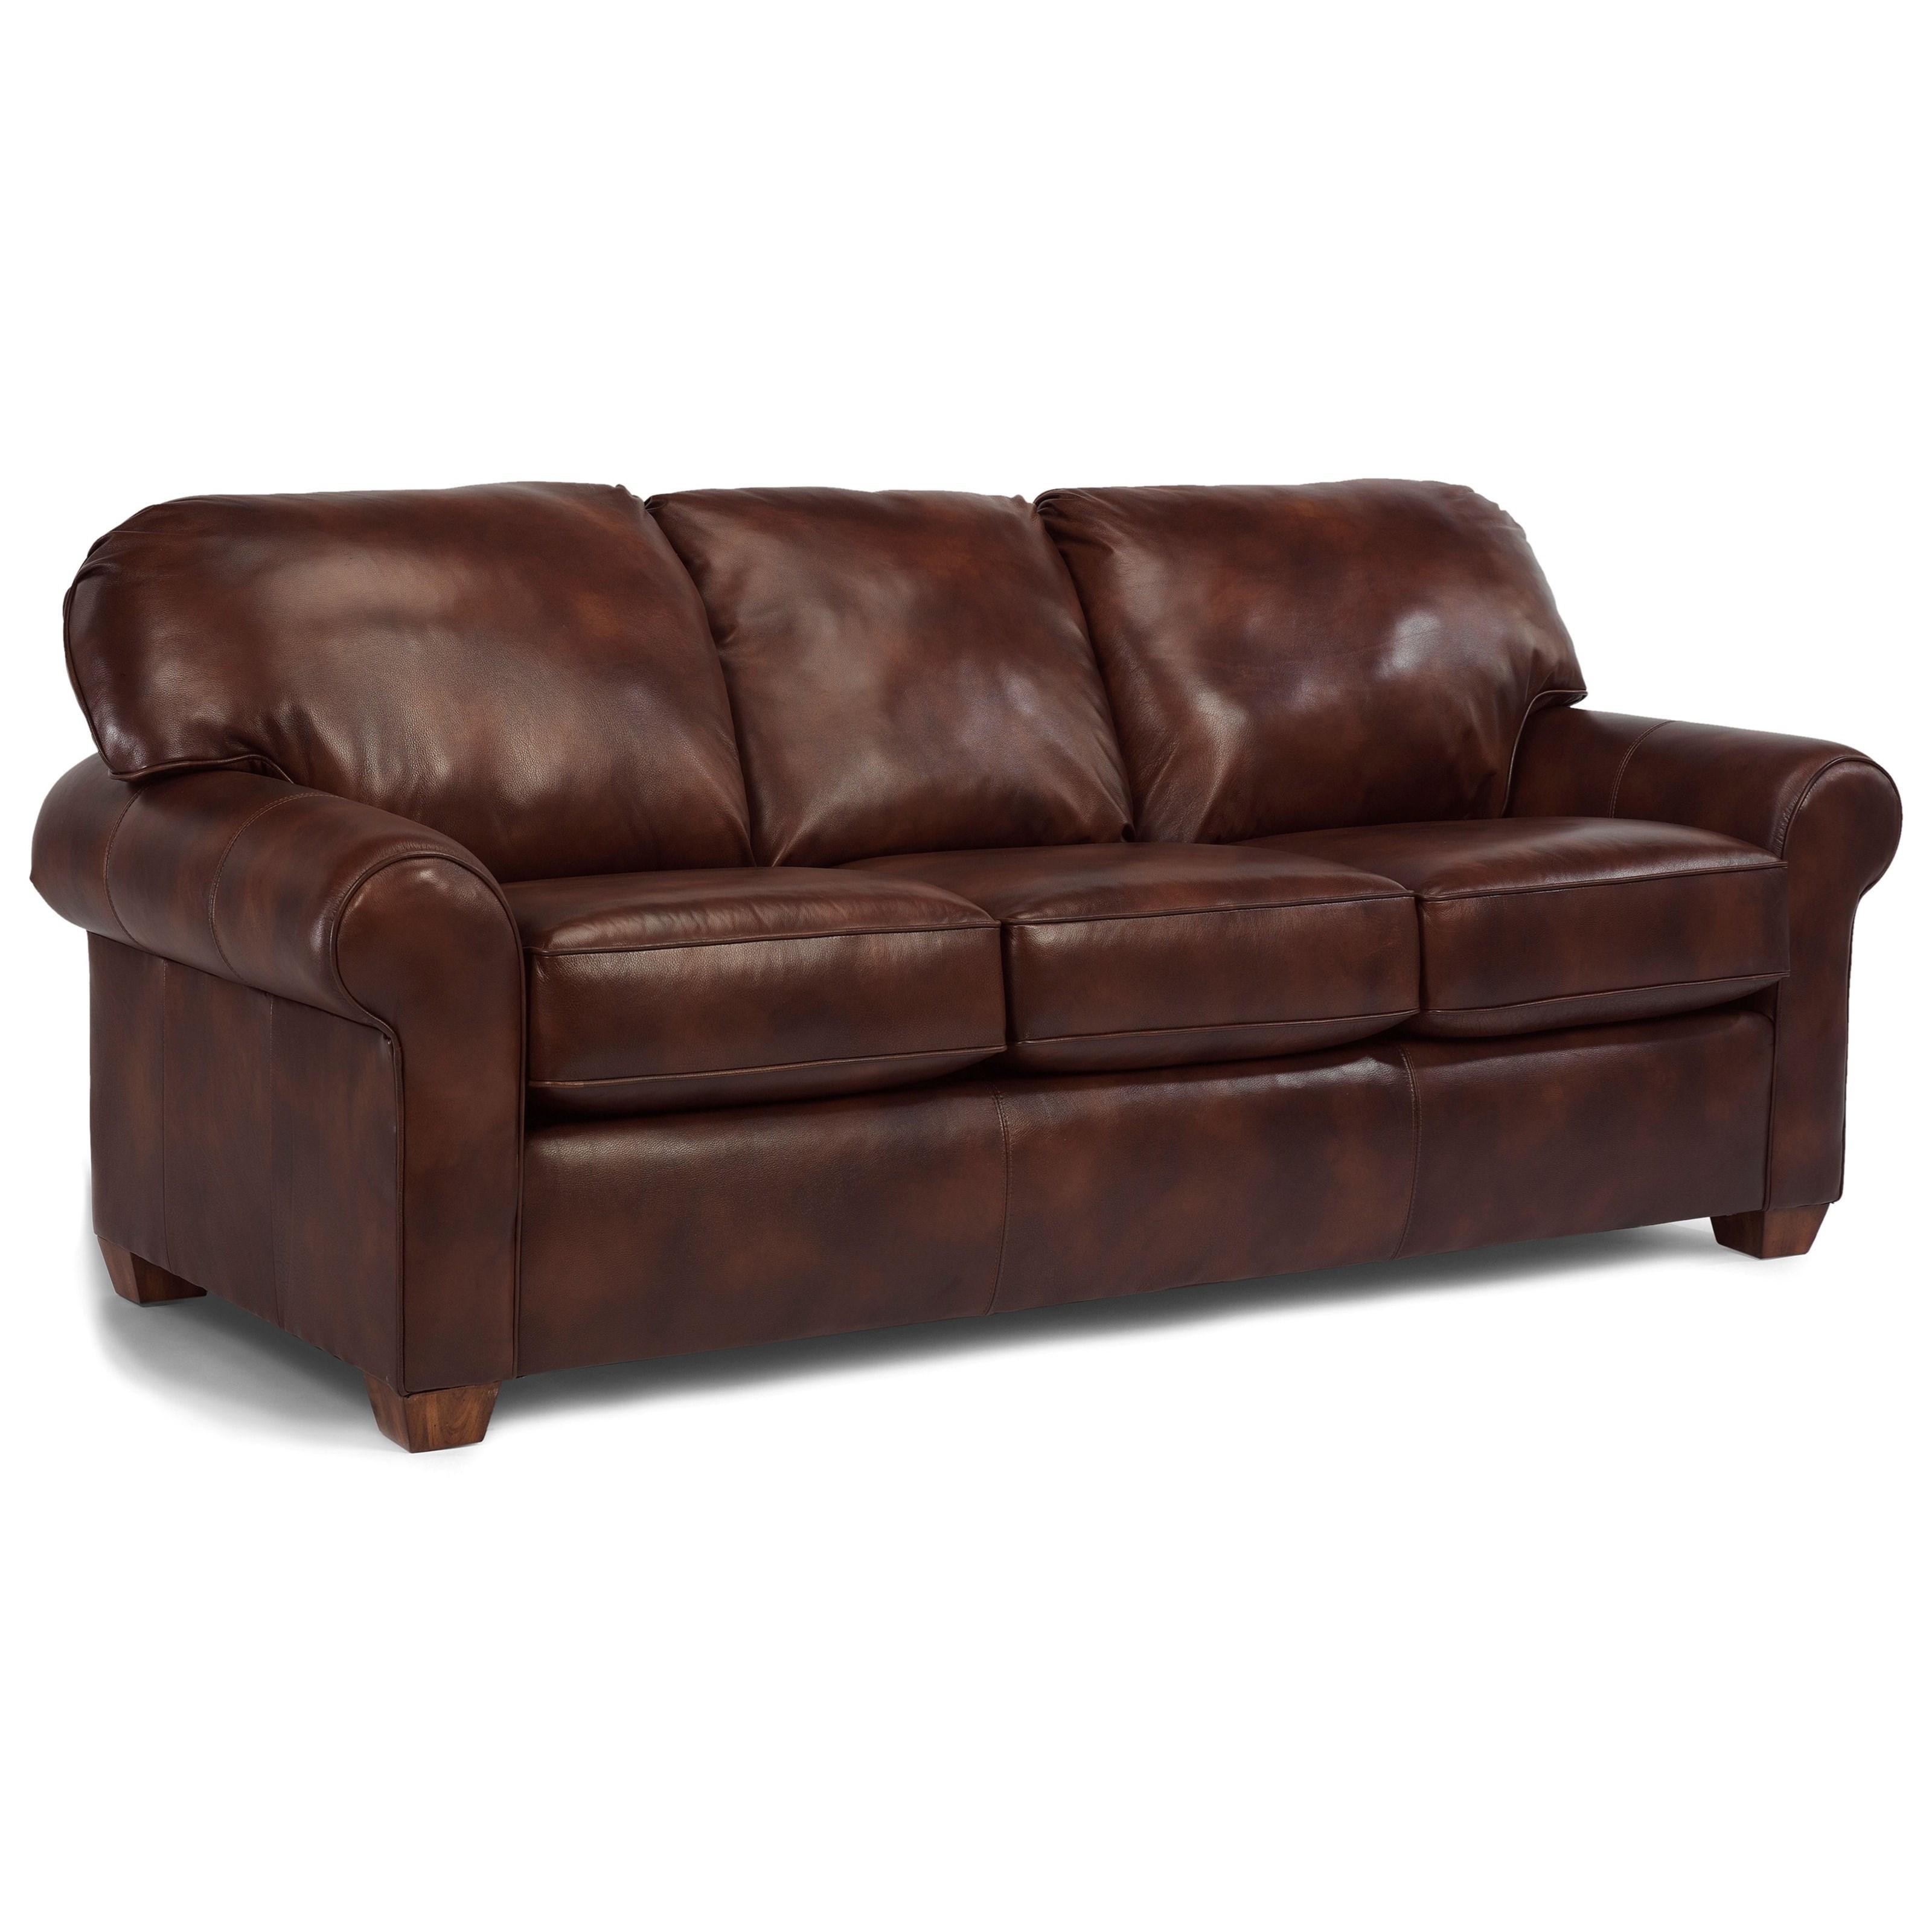 flexsteel sofa sets tribecca home eland black bonded leather set thornton stationary upholstered olinde 39s